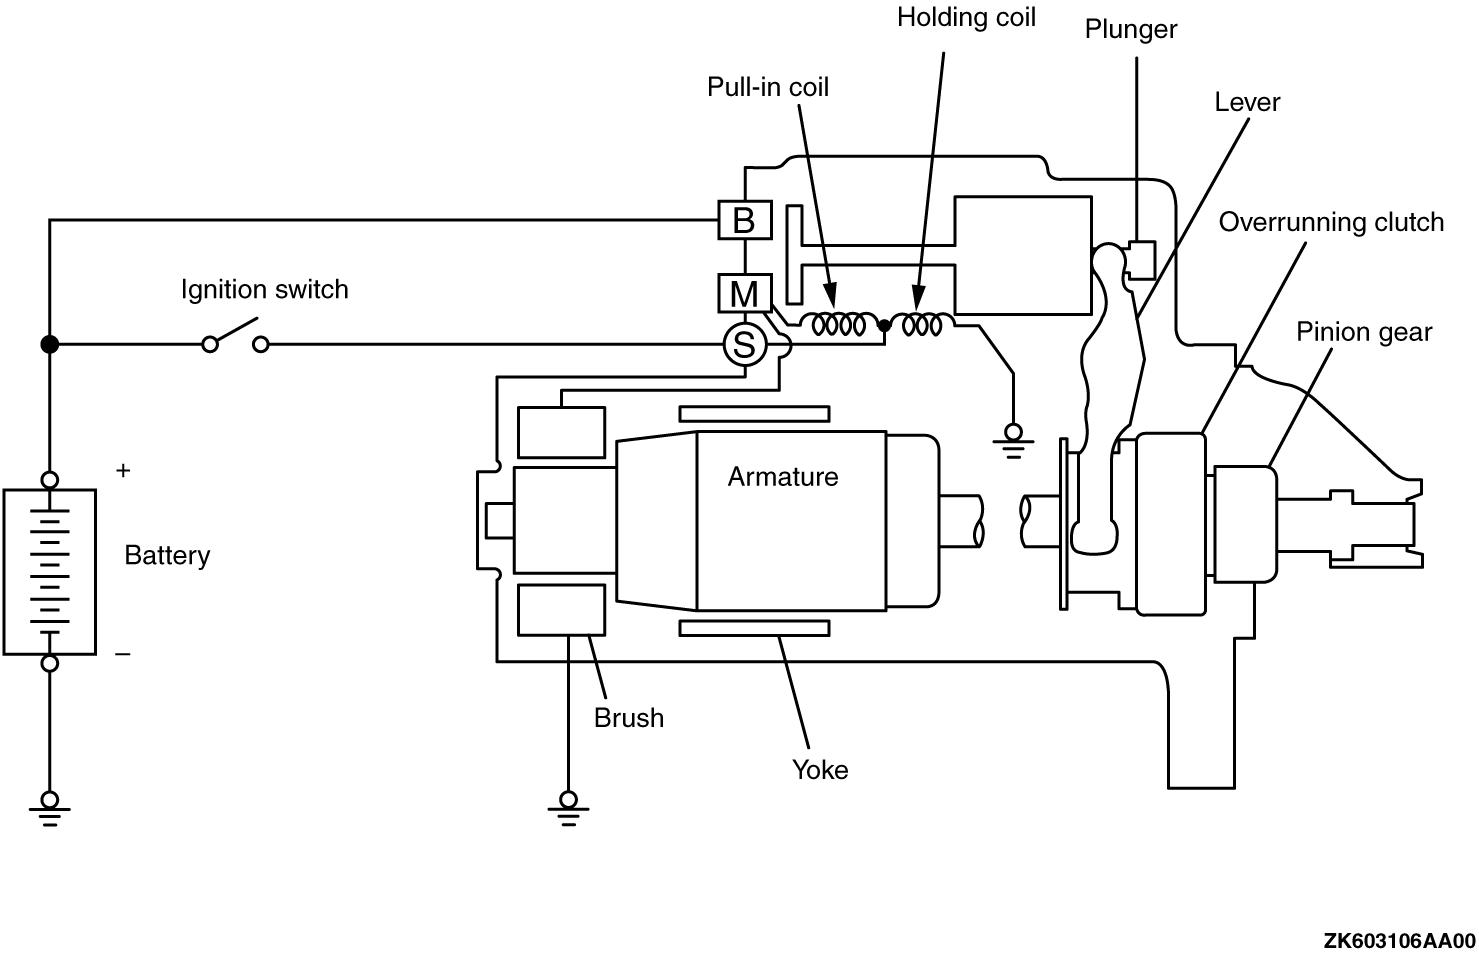 general information crown and pinion gear starter pinion gear schematic #24